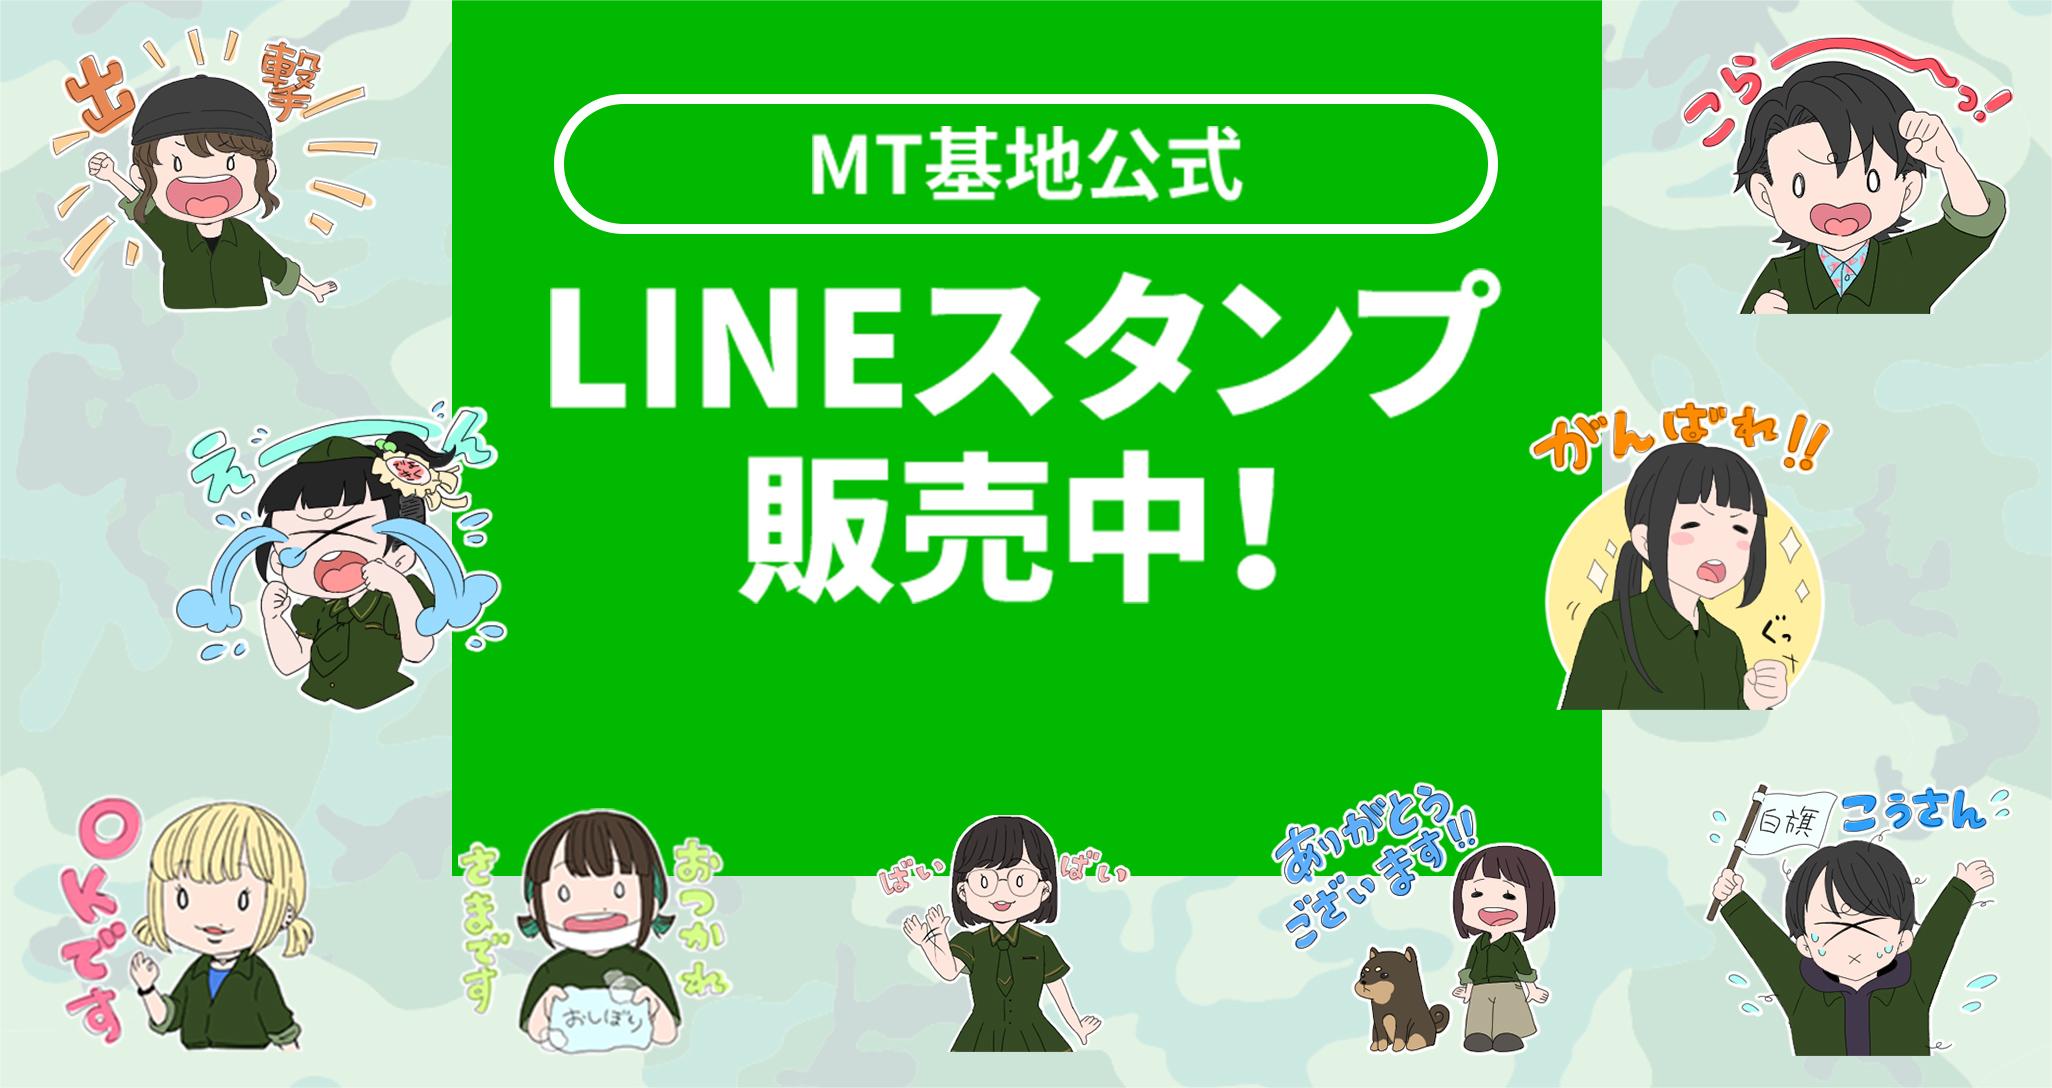 MT基地公式 LINEスタンプ販売中!